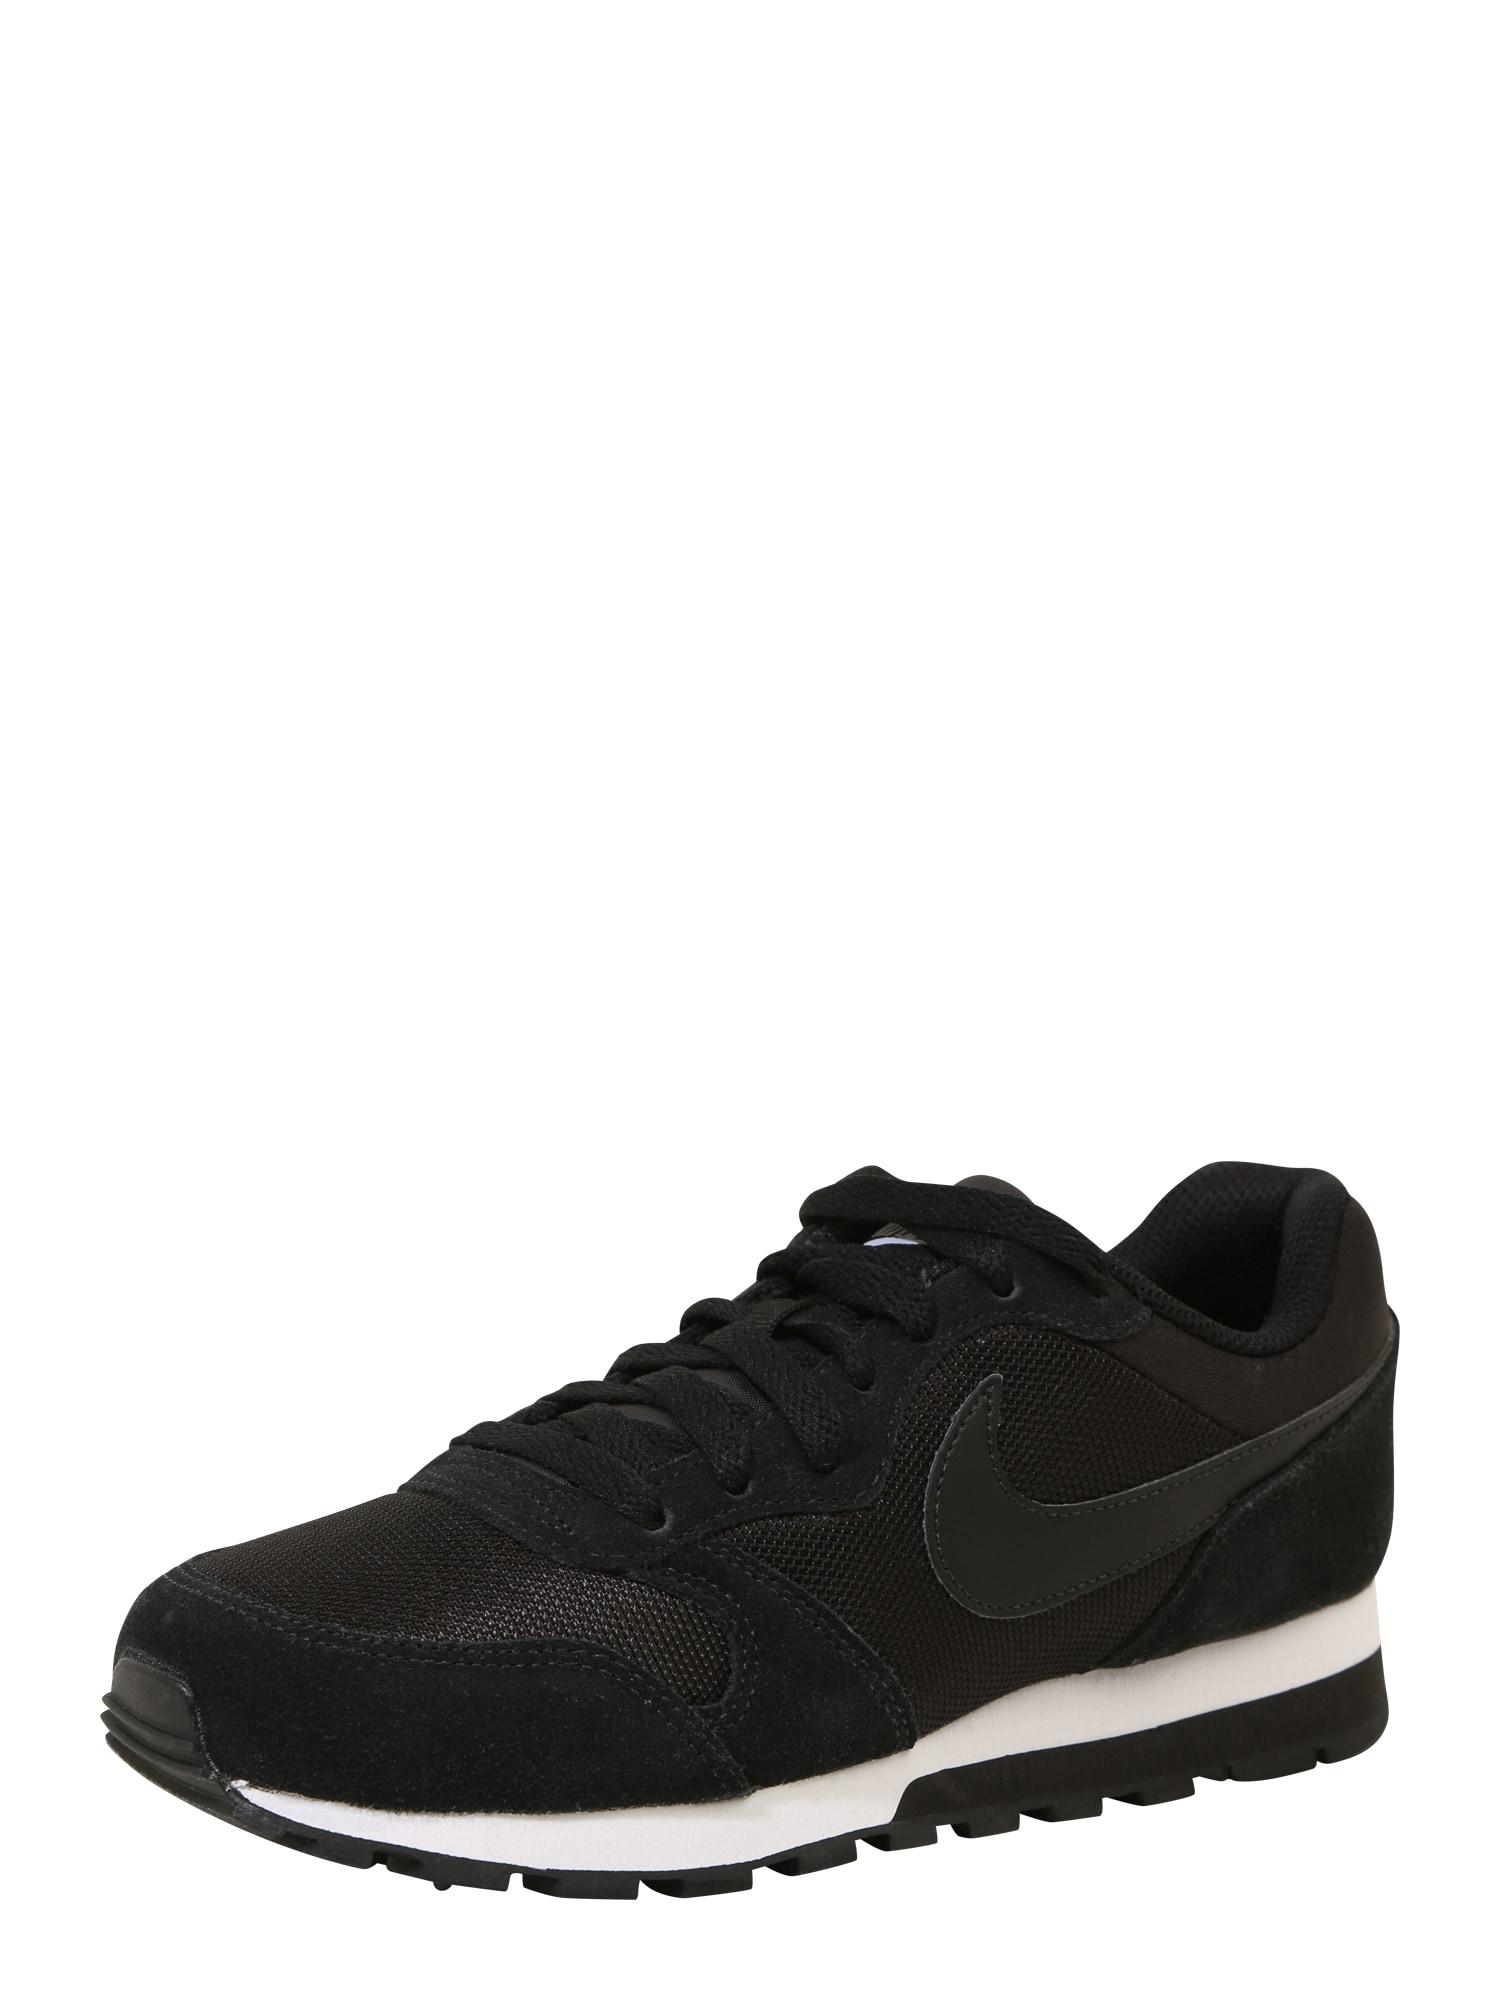 Tenisky Runner 2 černá Nike Sportswear